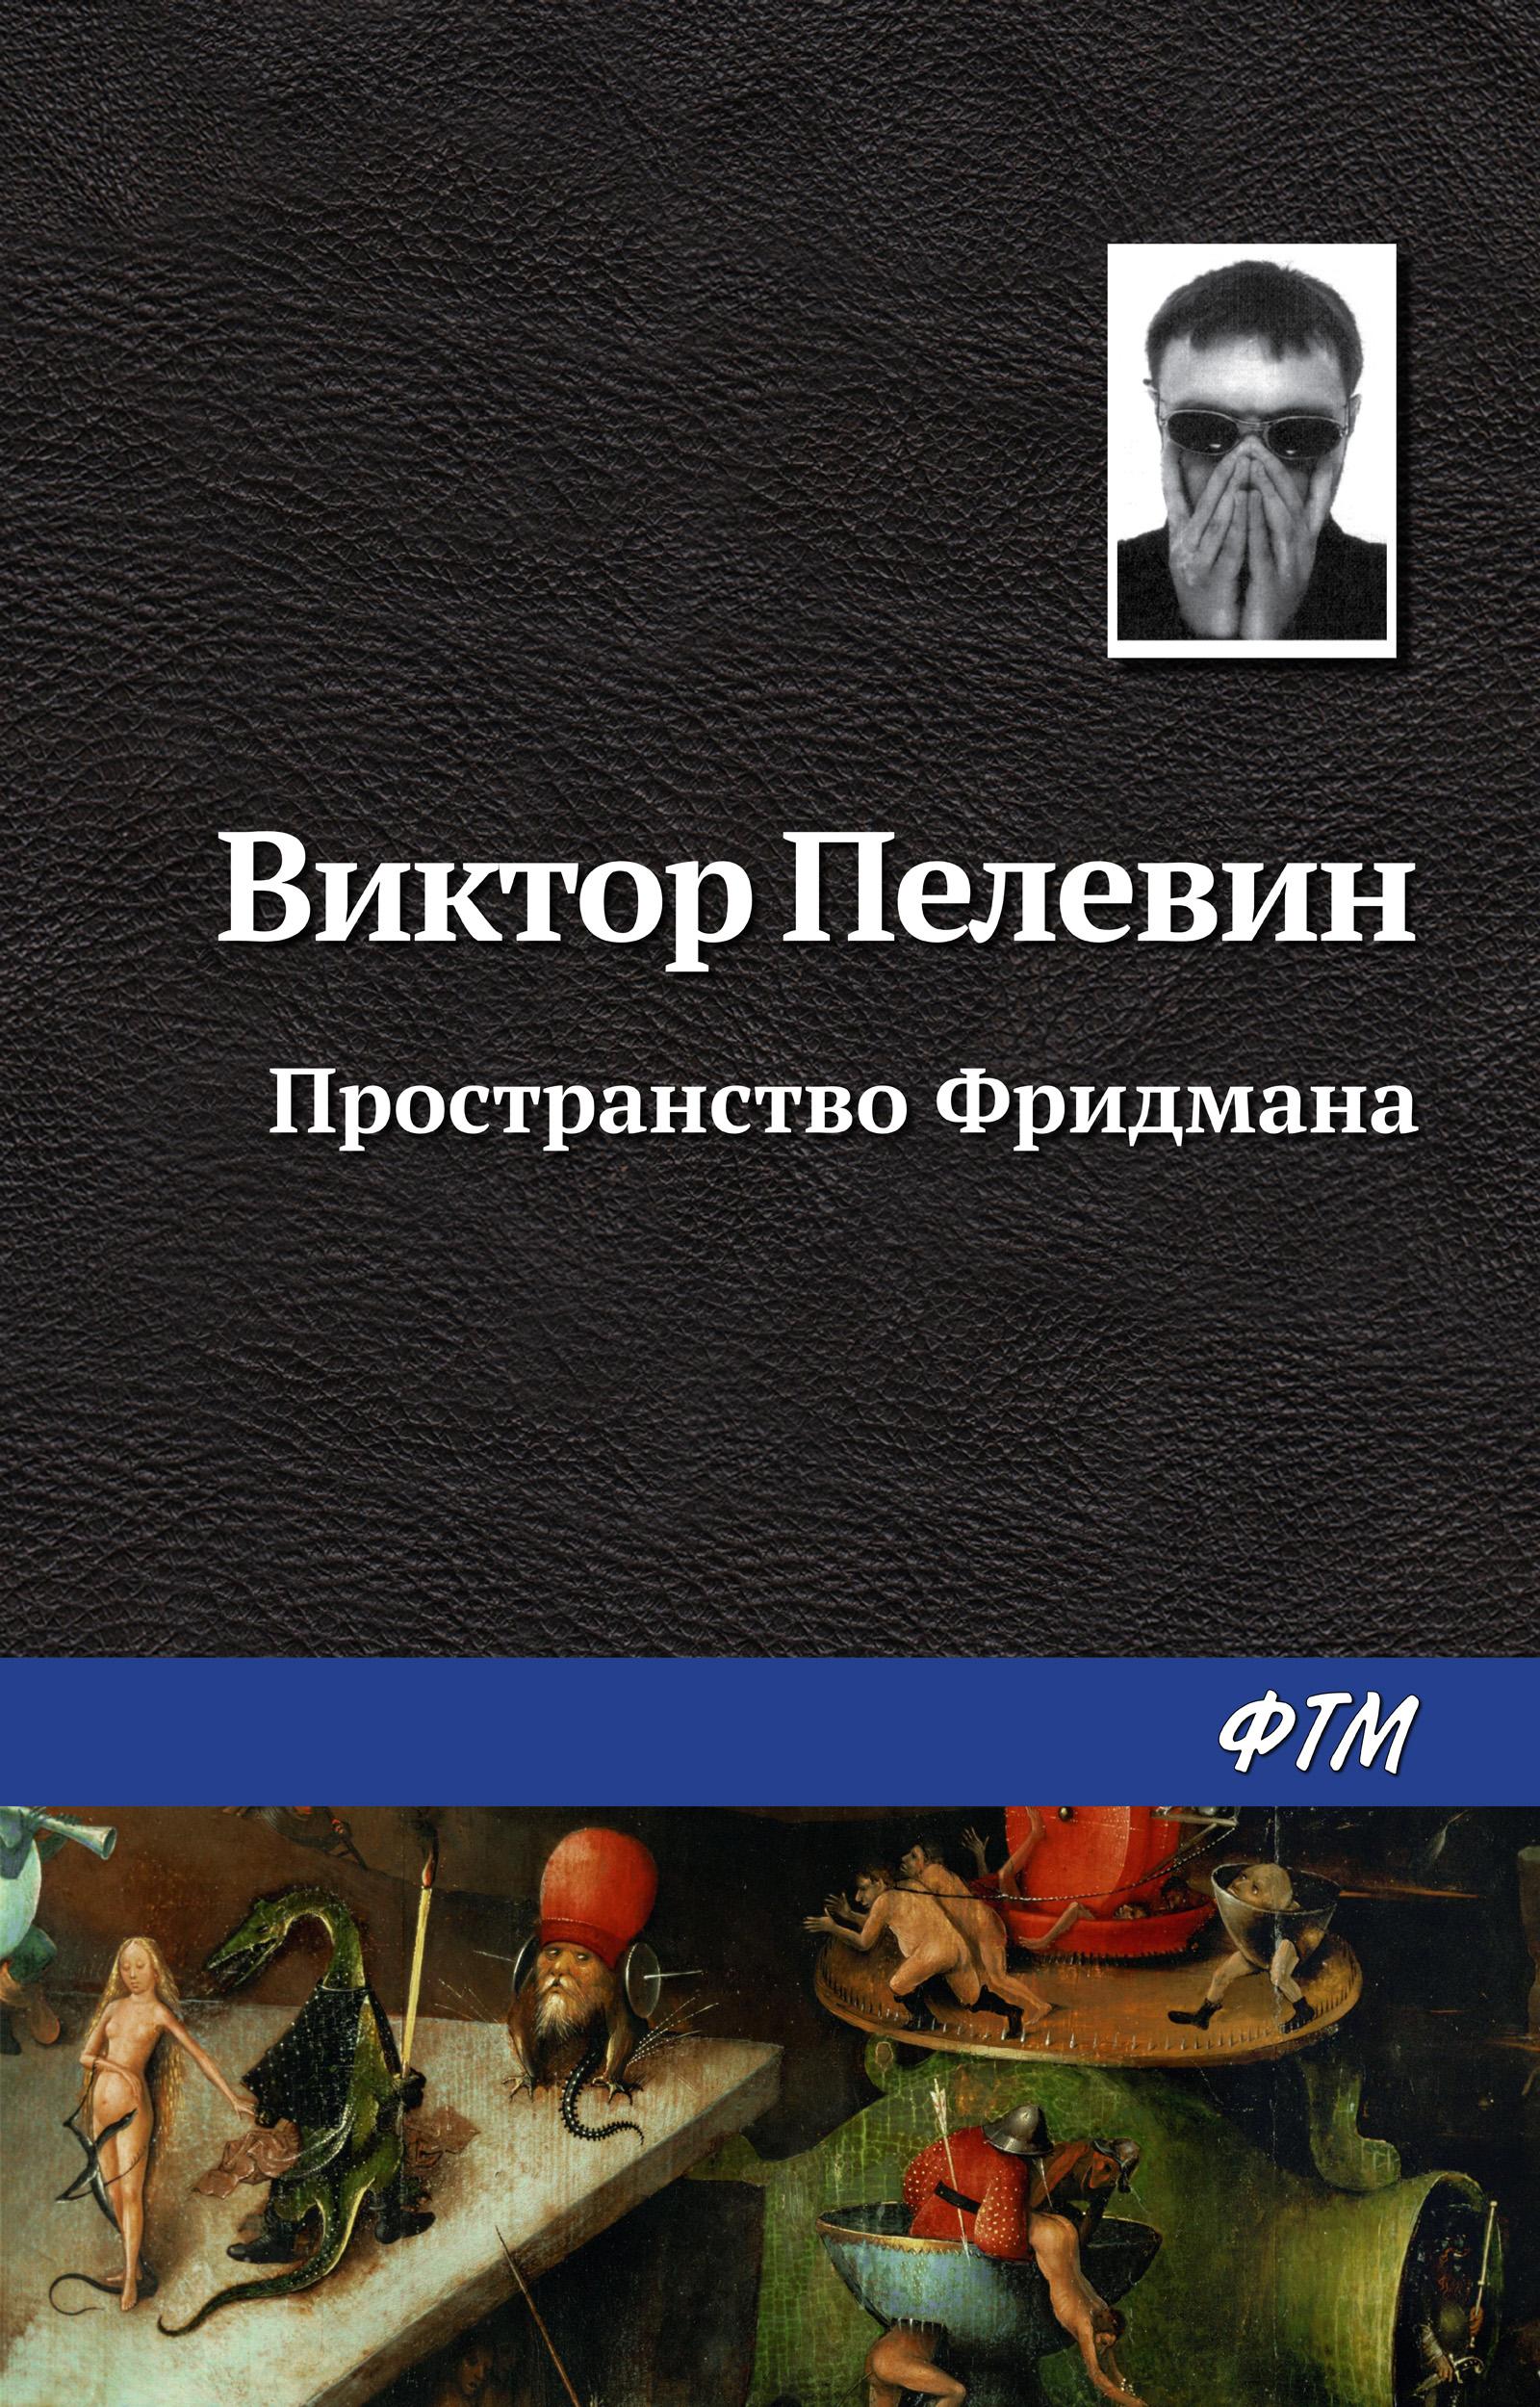 Виктор Пелевин Пространство Фридмана виктор пелевин пространство фридмана